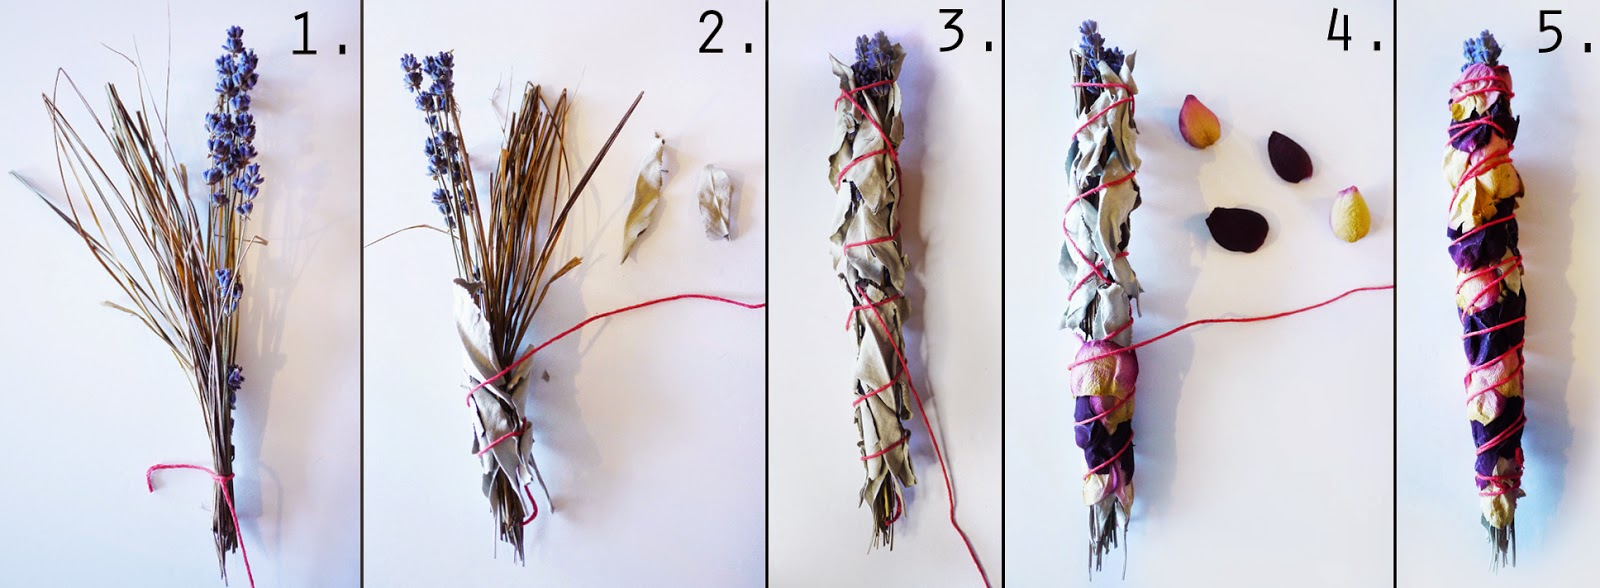 rebelsixtysix - rebel66 com official blog: How To Make A Floral